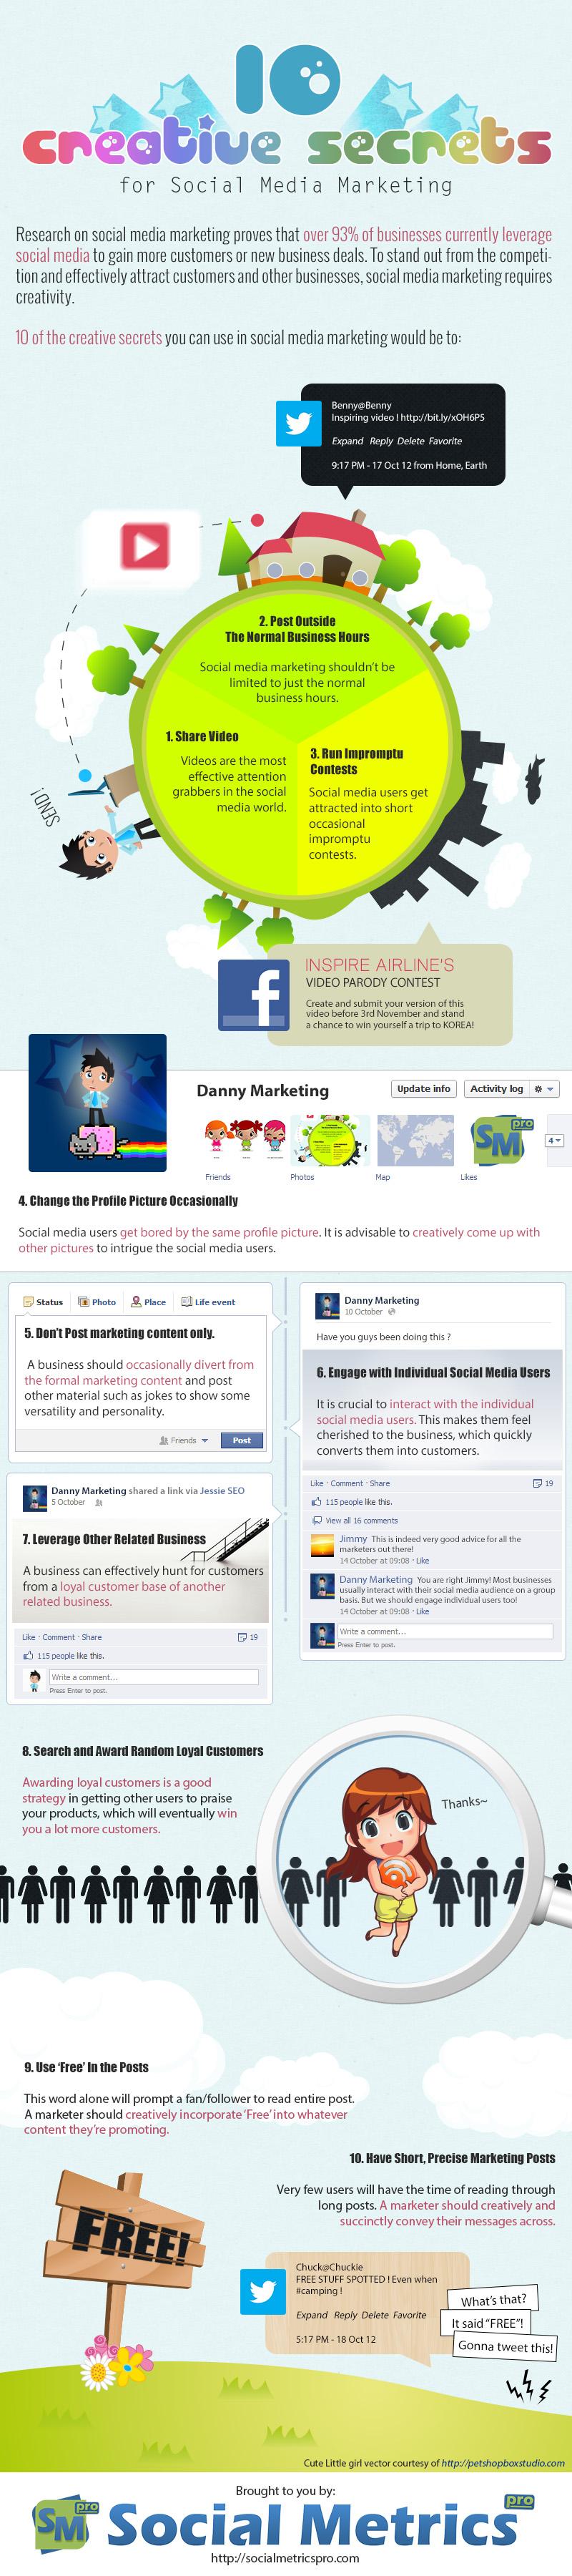 Creative Secrets for Marketing on Social Media